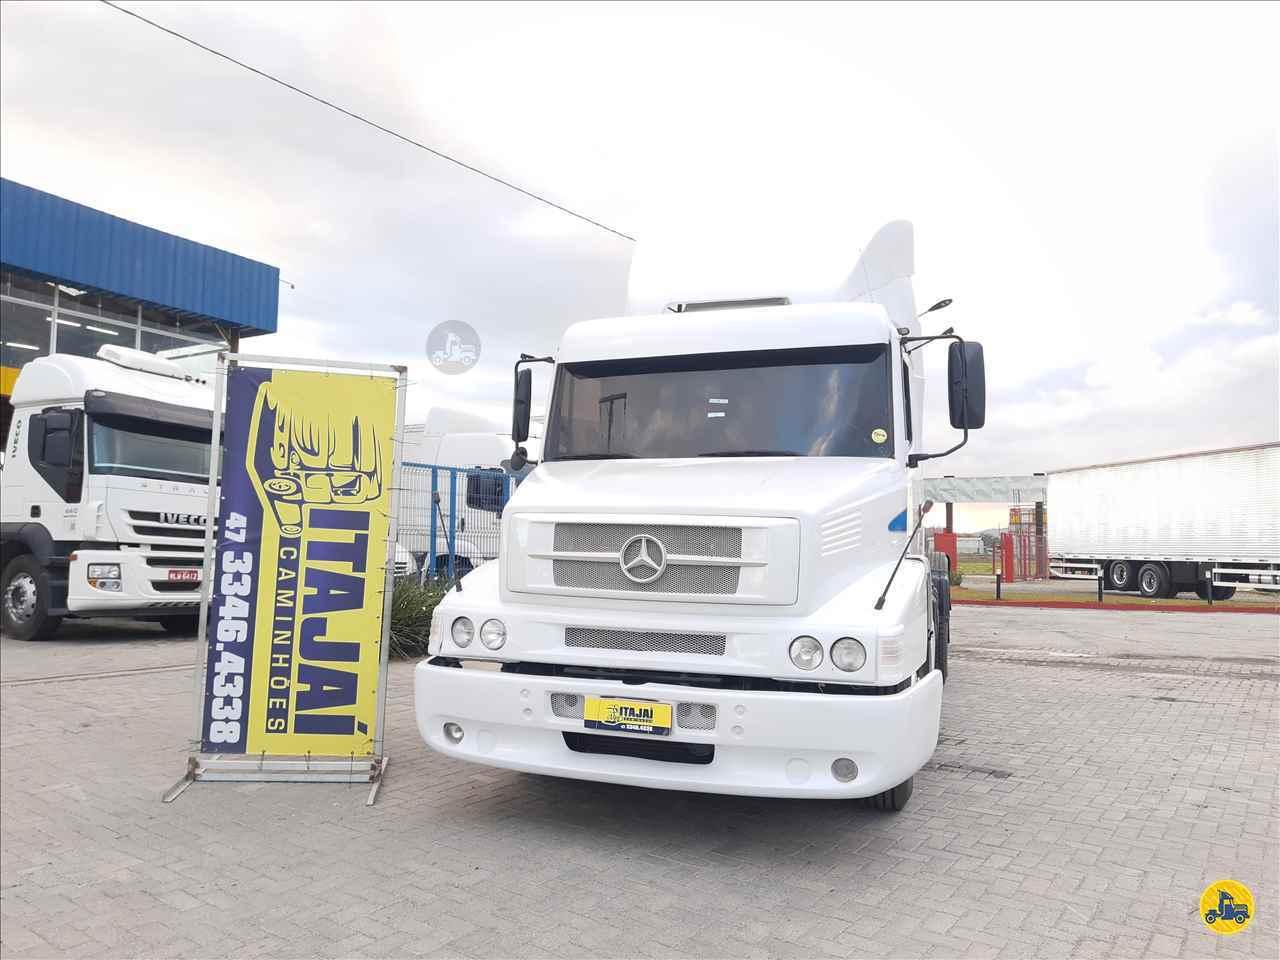 CAMINHAO MERCEDES-BENZ MB 1634 Cavalo Mecânico Truck 6x2 Itajai Caminhões NAVEGANTES SANTA CATARINA SC